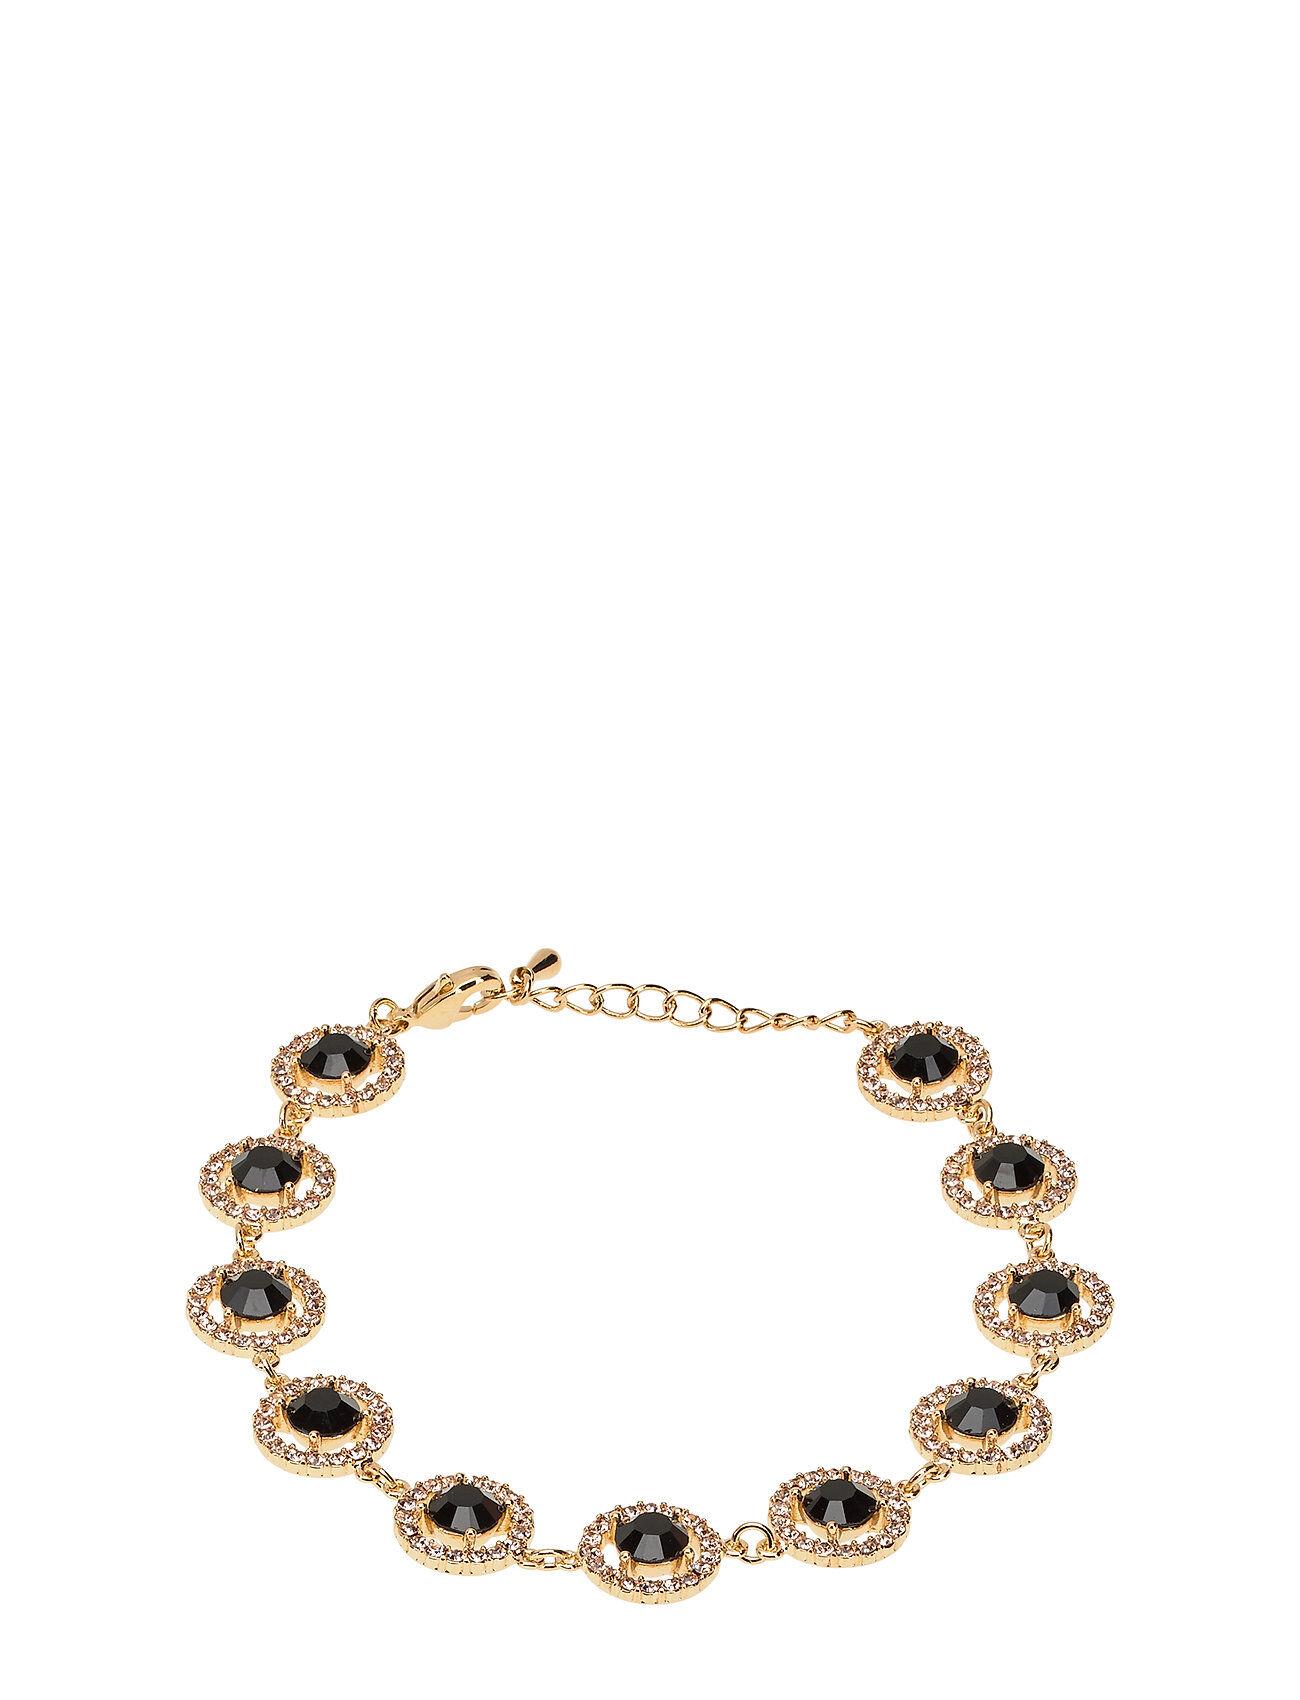 LILY AND ROSE Miranda Bracelet - Jet Accessories Jewellery Bracelets Chain Bracelets Musta LILY AND ROSE